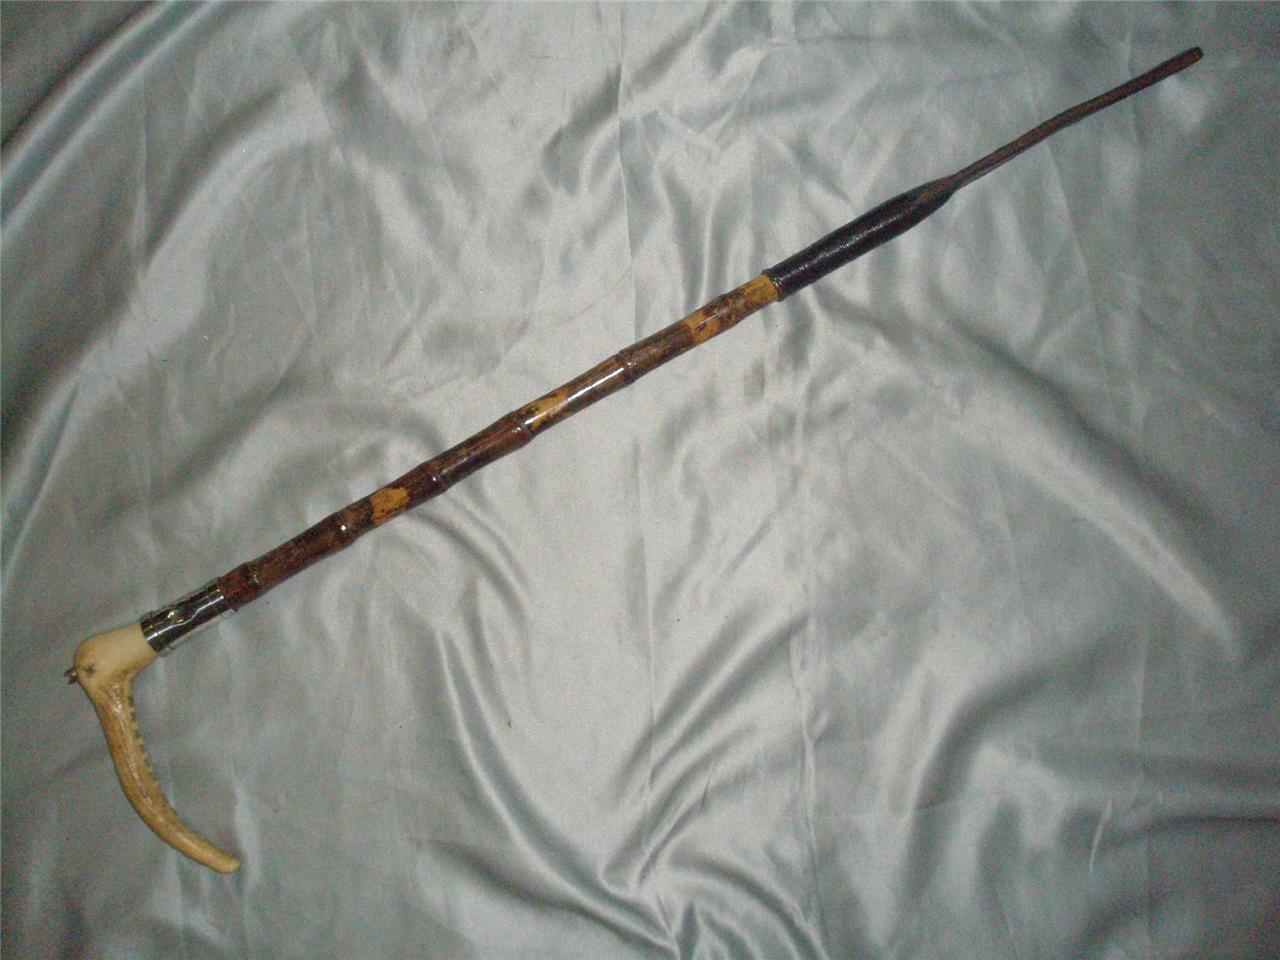 Antiguo Bambú Gentlemans Sellado Hunt Whip. By Champion & Wilton.